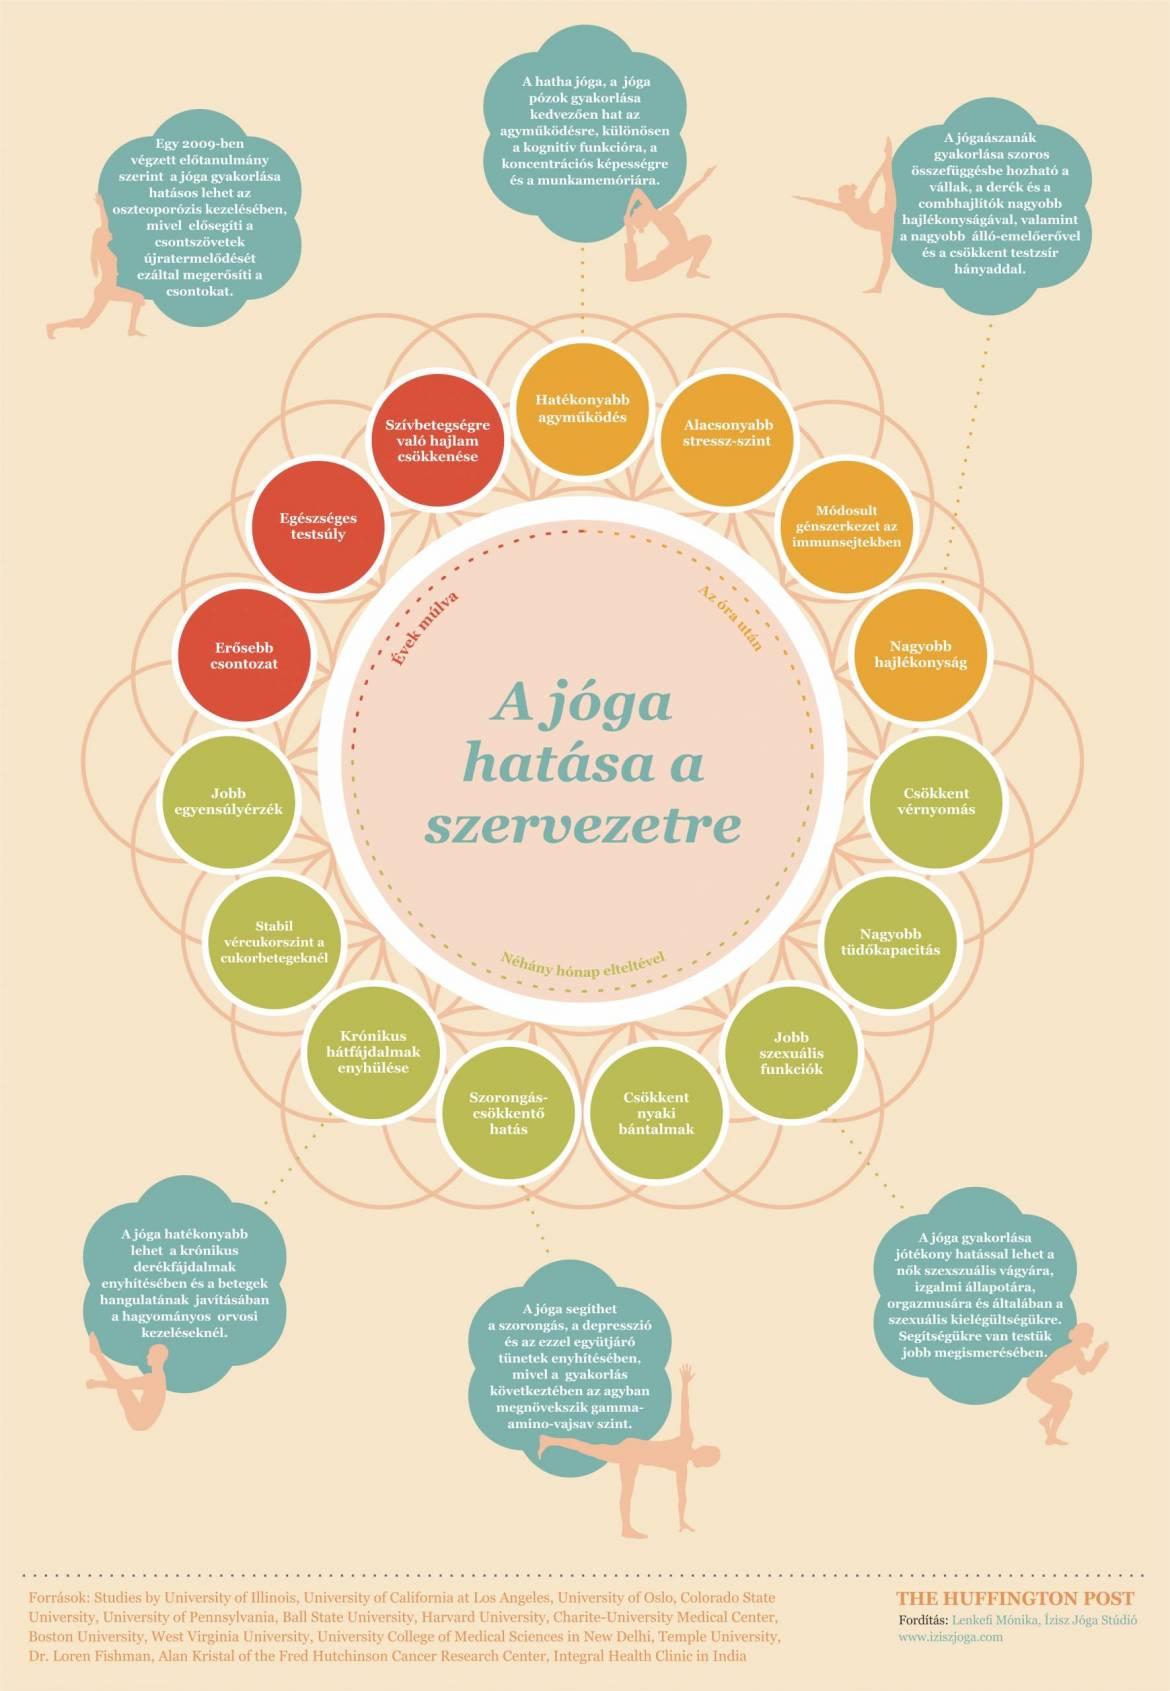 Yoga_infographic-scaled.jpg